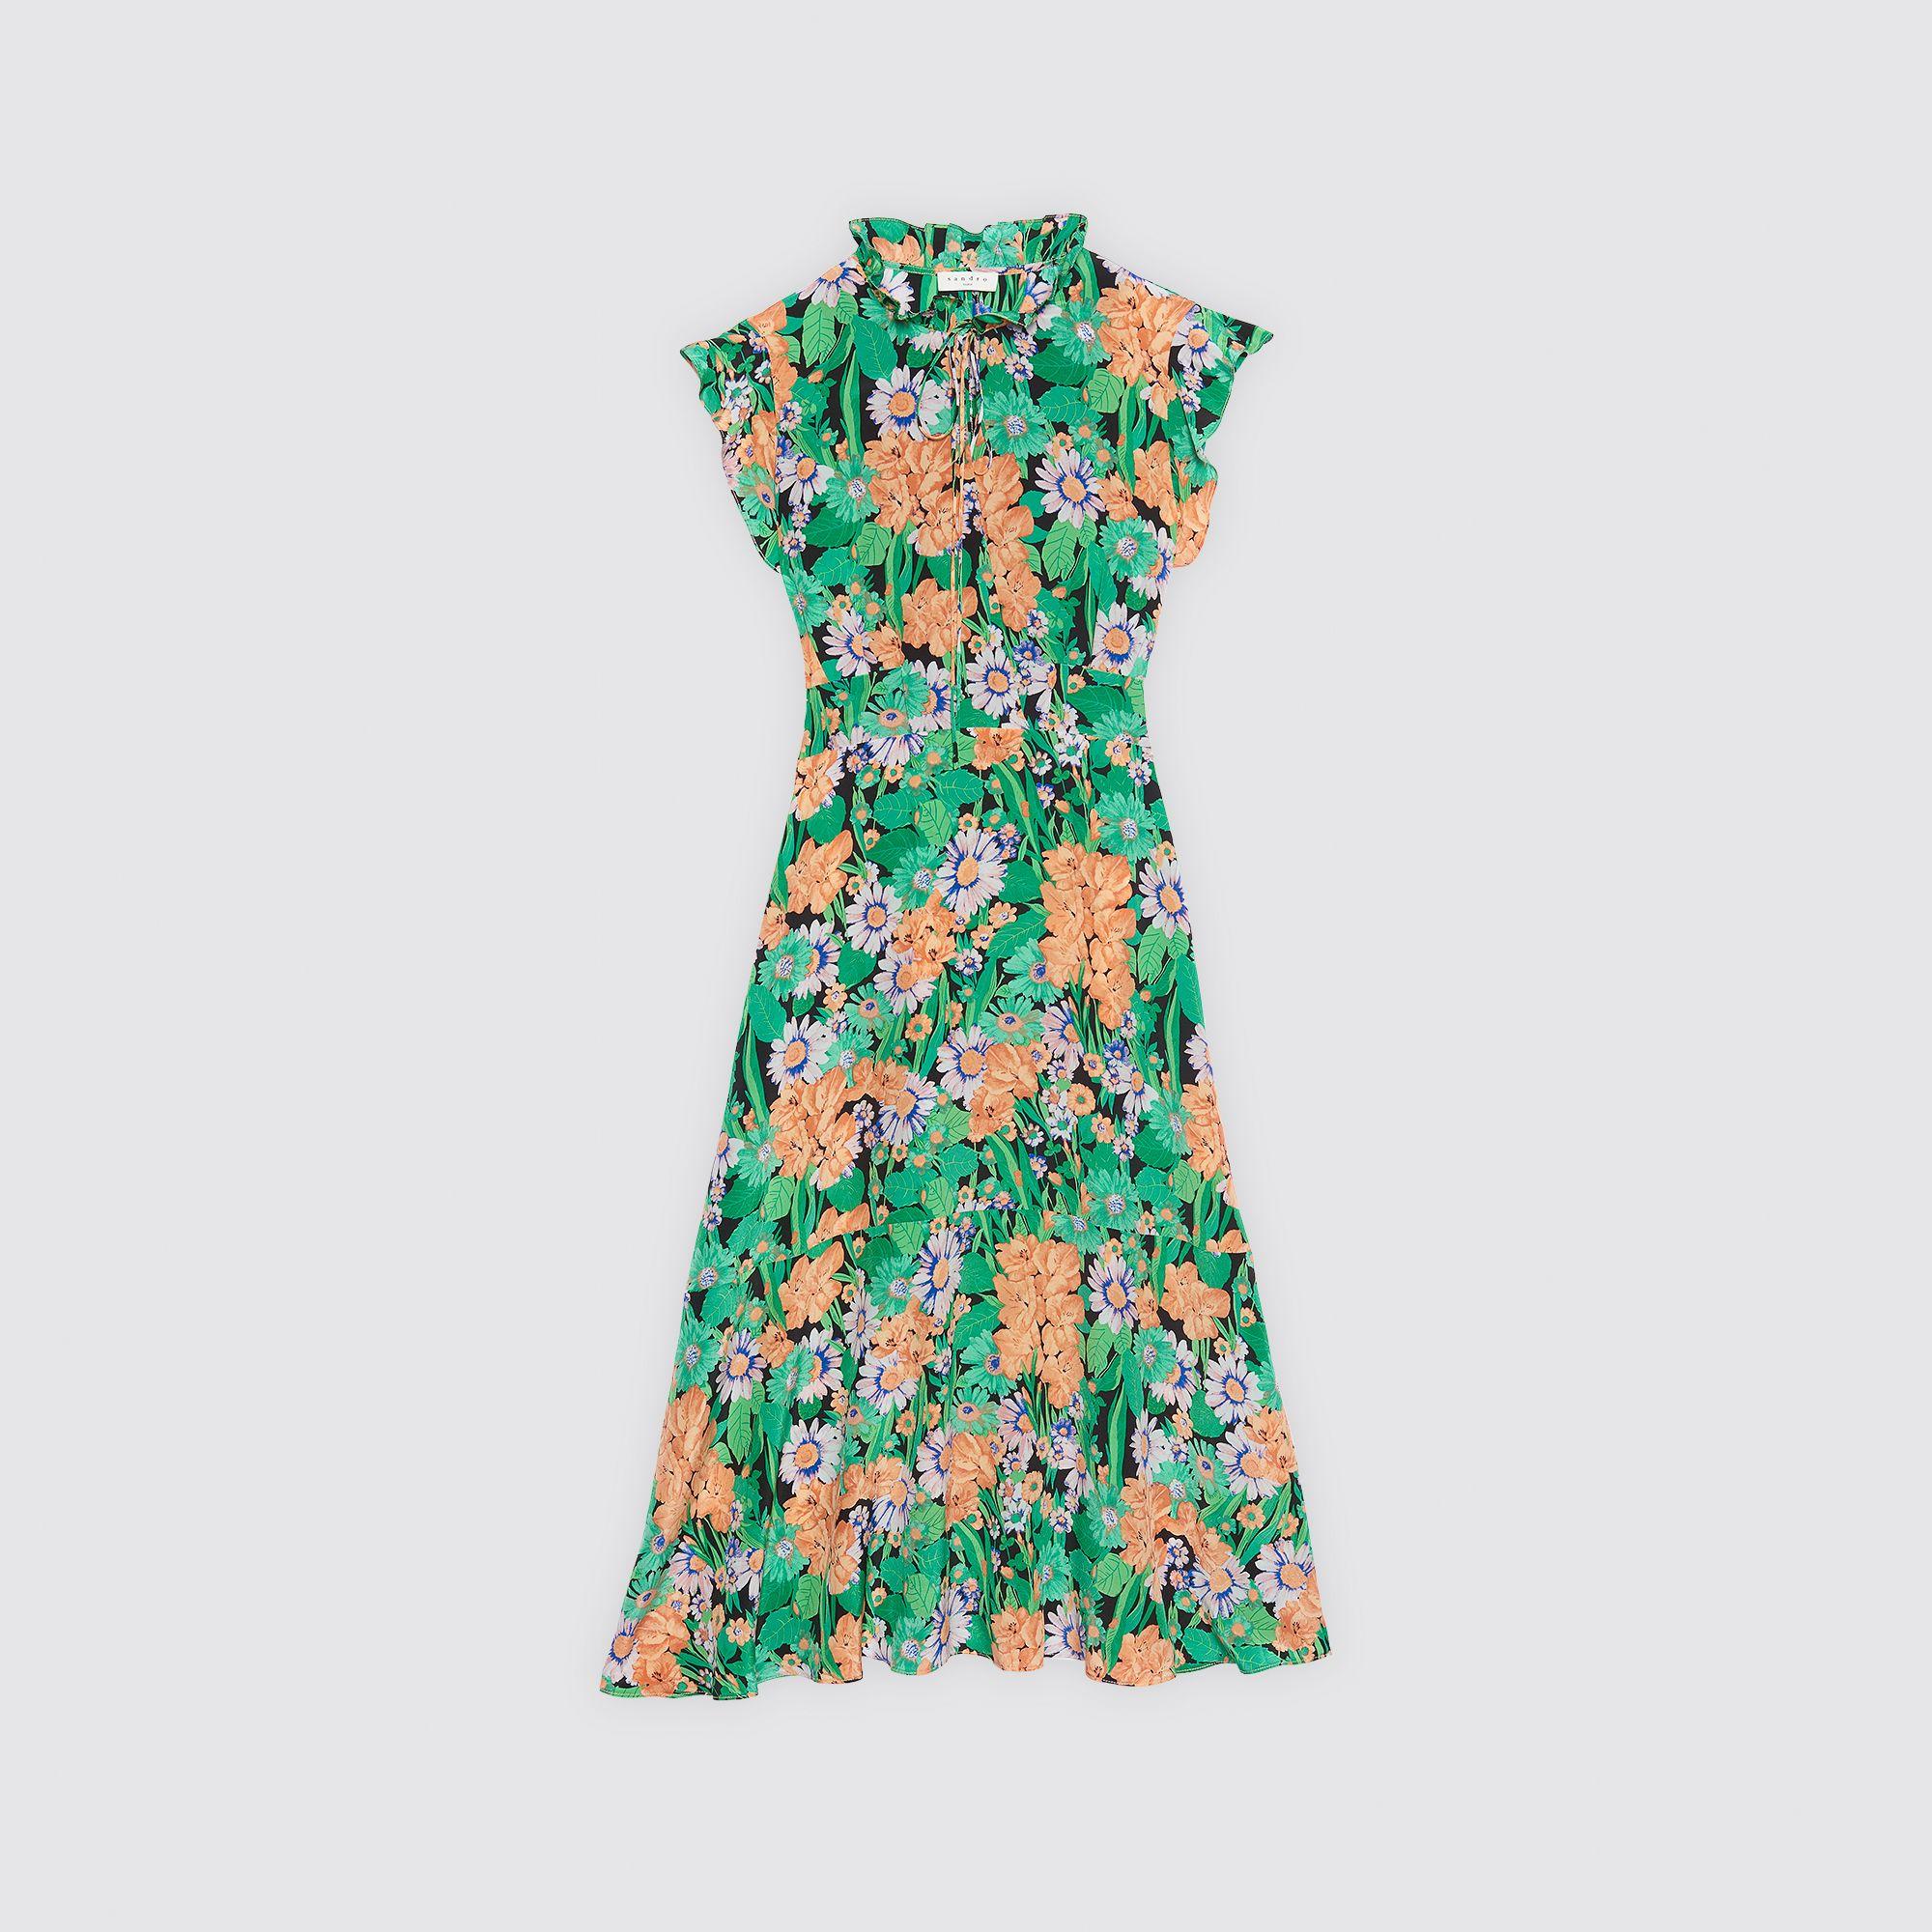 556bf806880 Mid-length silk dress with floral print - Dresses - Sandro-paris.com ...